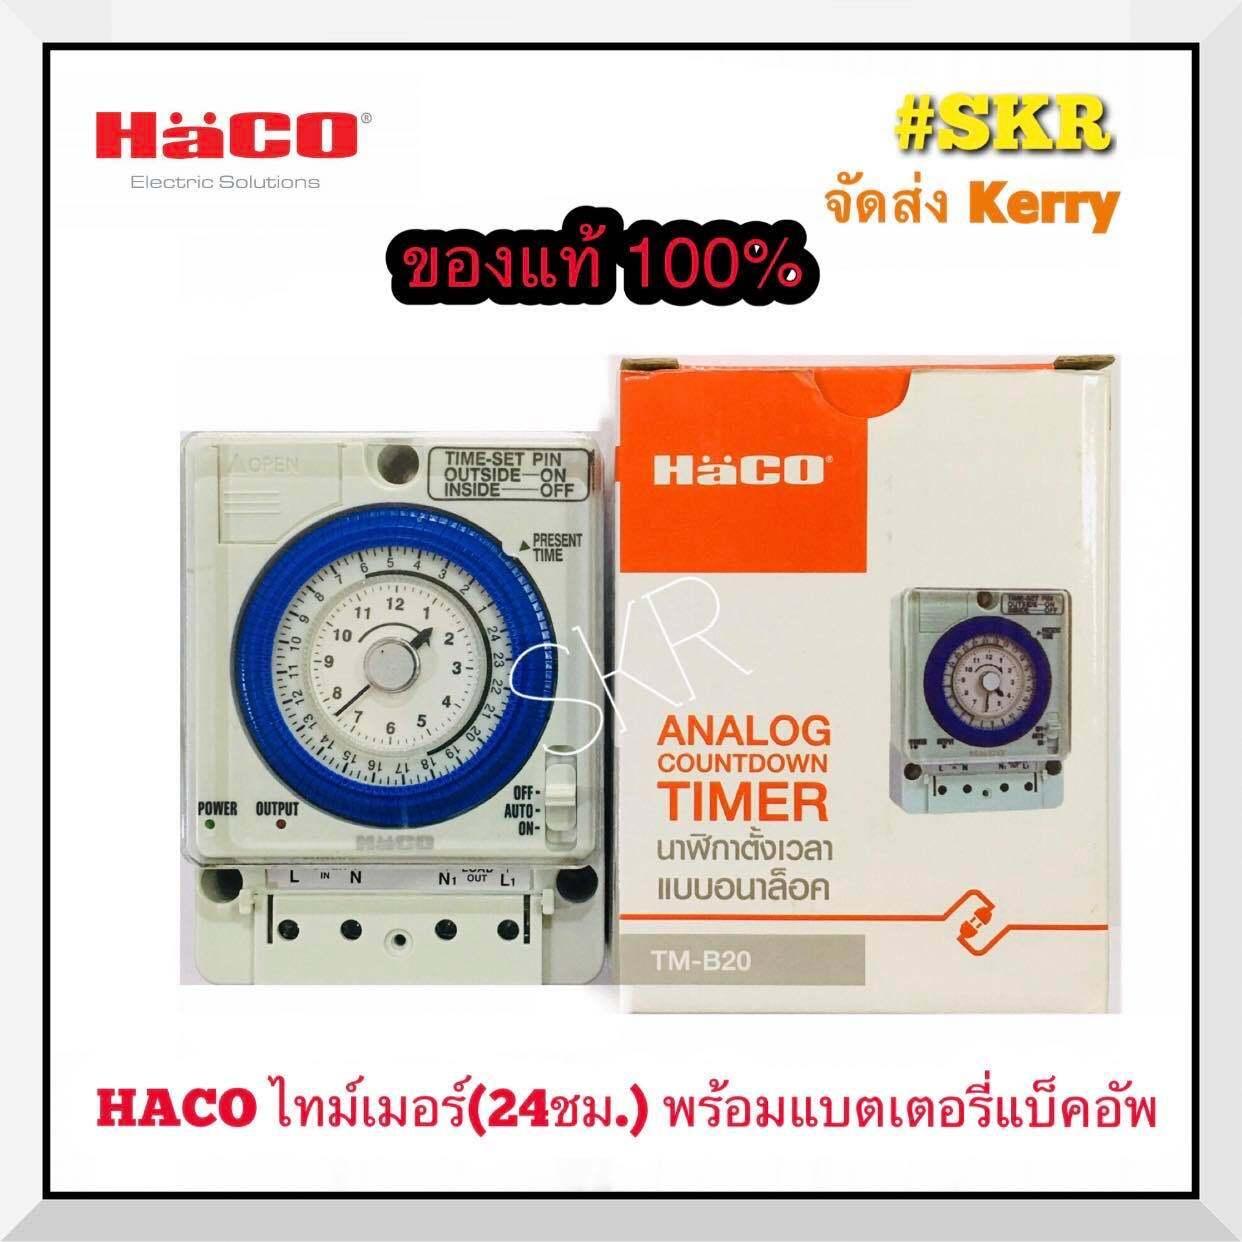 Timer HACO ไทม์เมอร์ นาฬิกาตั้งเวลามีแบตเตอร์รี่สำรองไฟ (Timer Switch) รุ่น TM-B20 สวิทช์ตั้งเวลา ทามเมอร์ จัดส่งฟรีเคอรี่